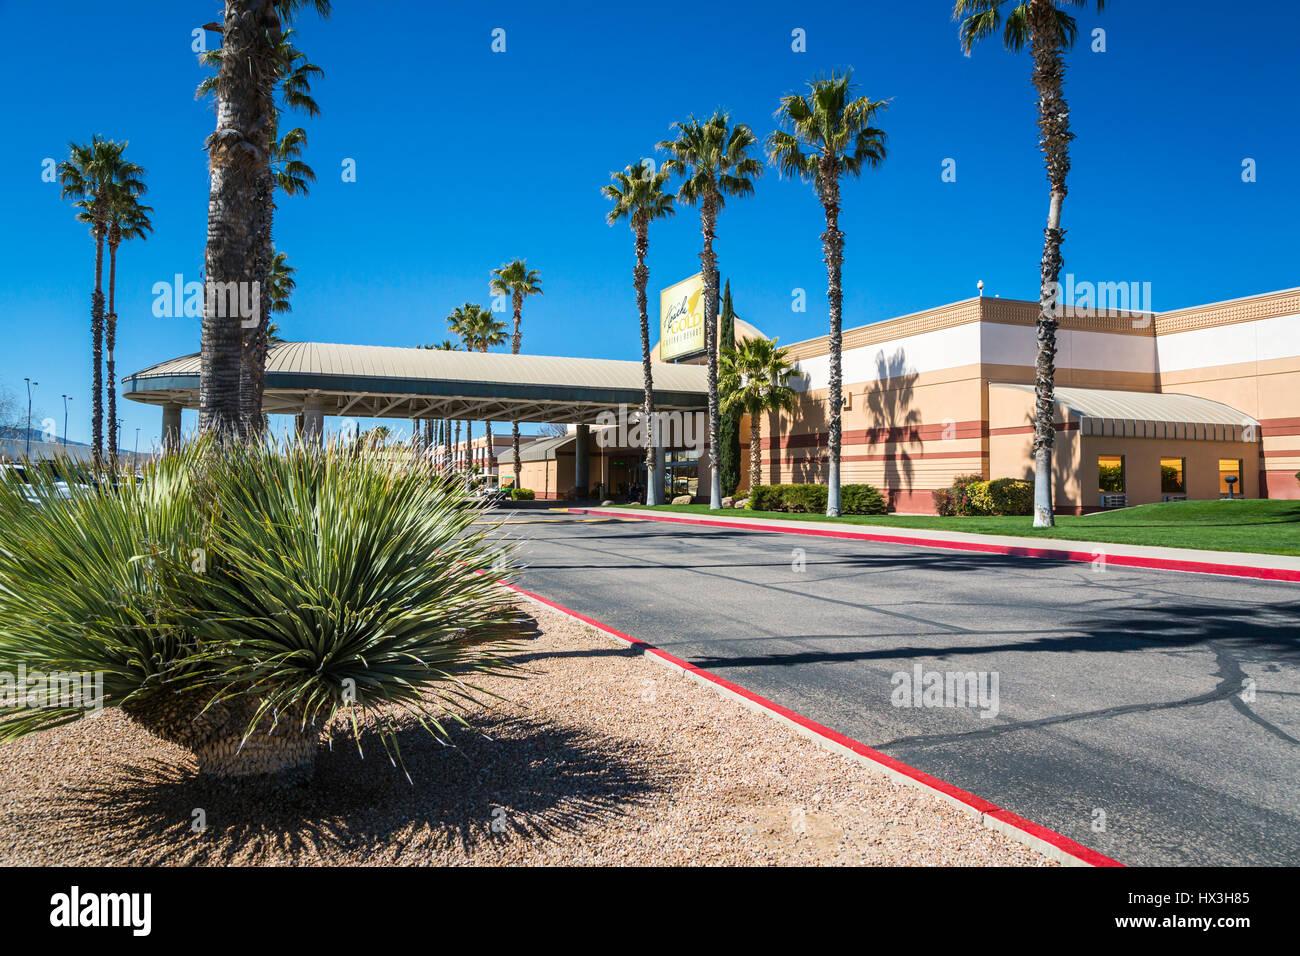 Apache gold casino in globe arizona inception of online gambling